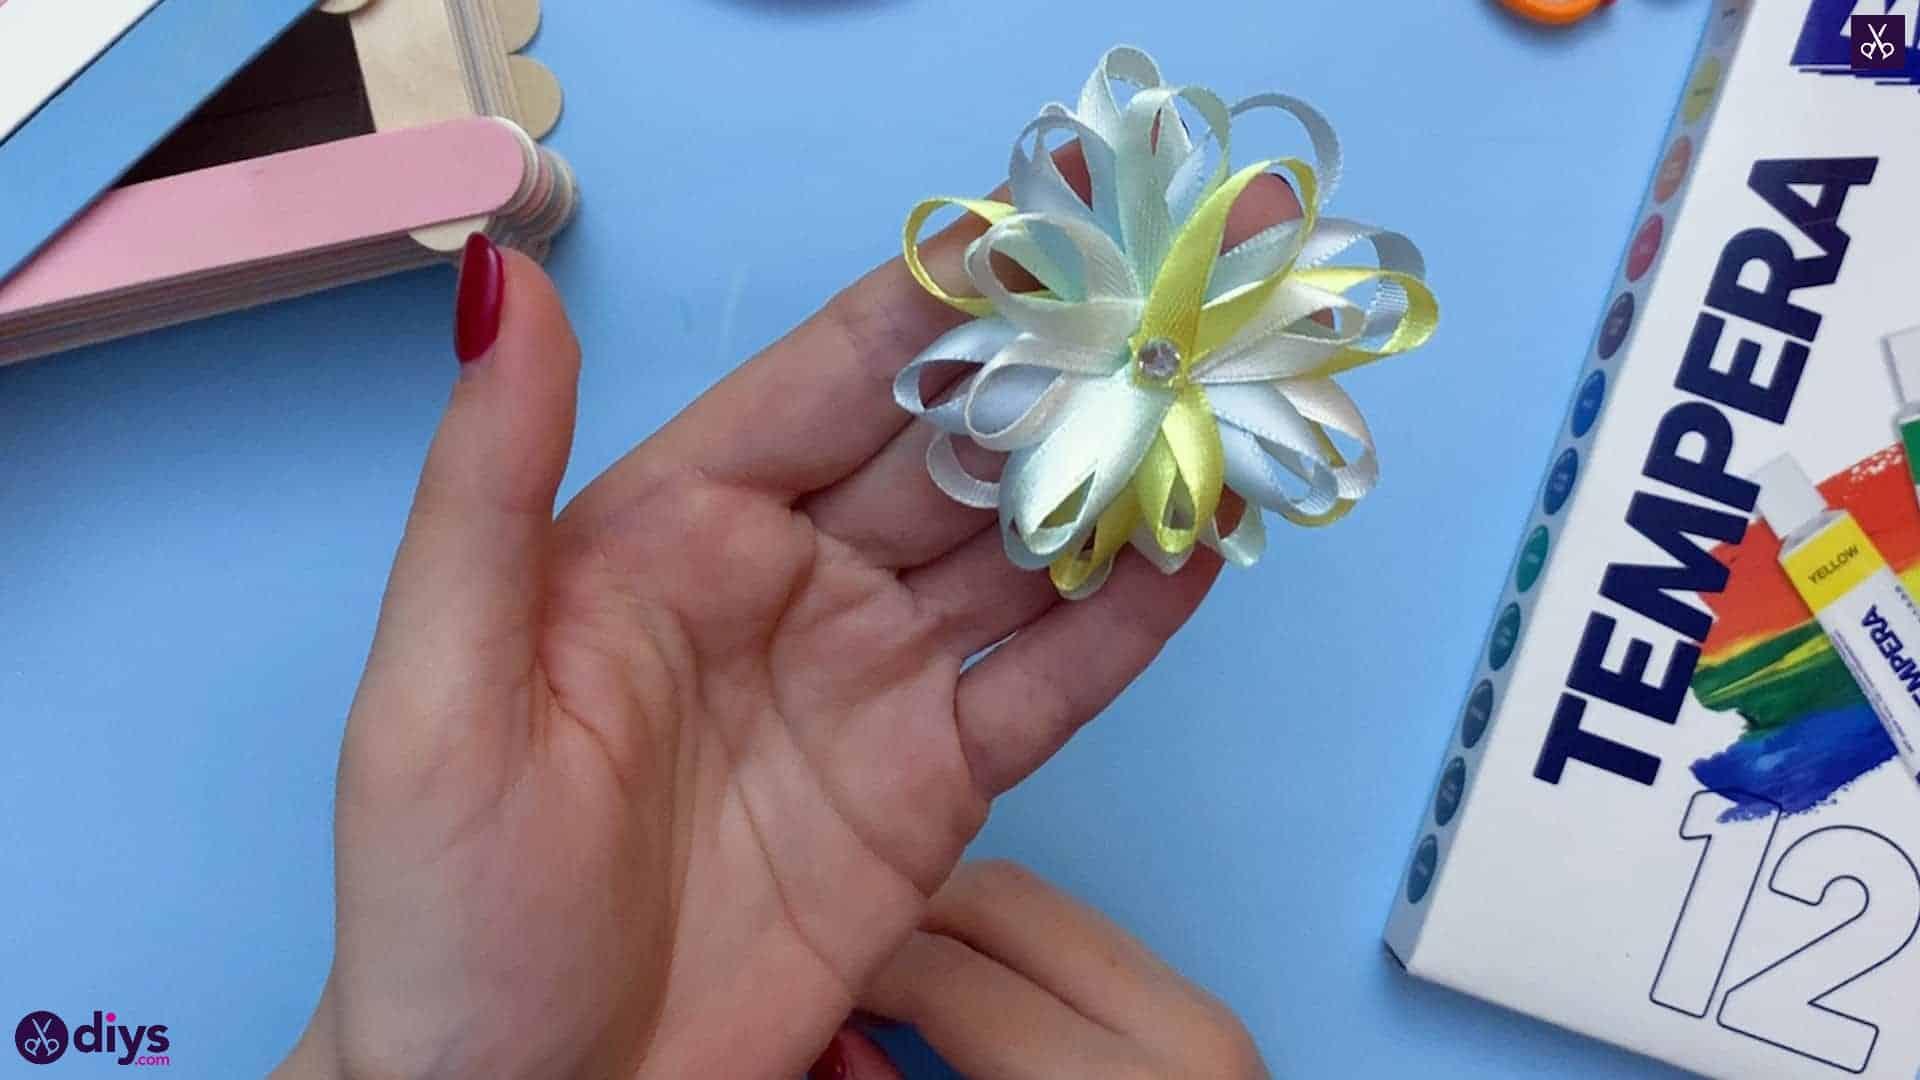 Diy popsicle stick jewelry box flower